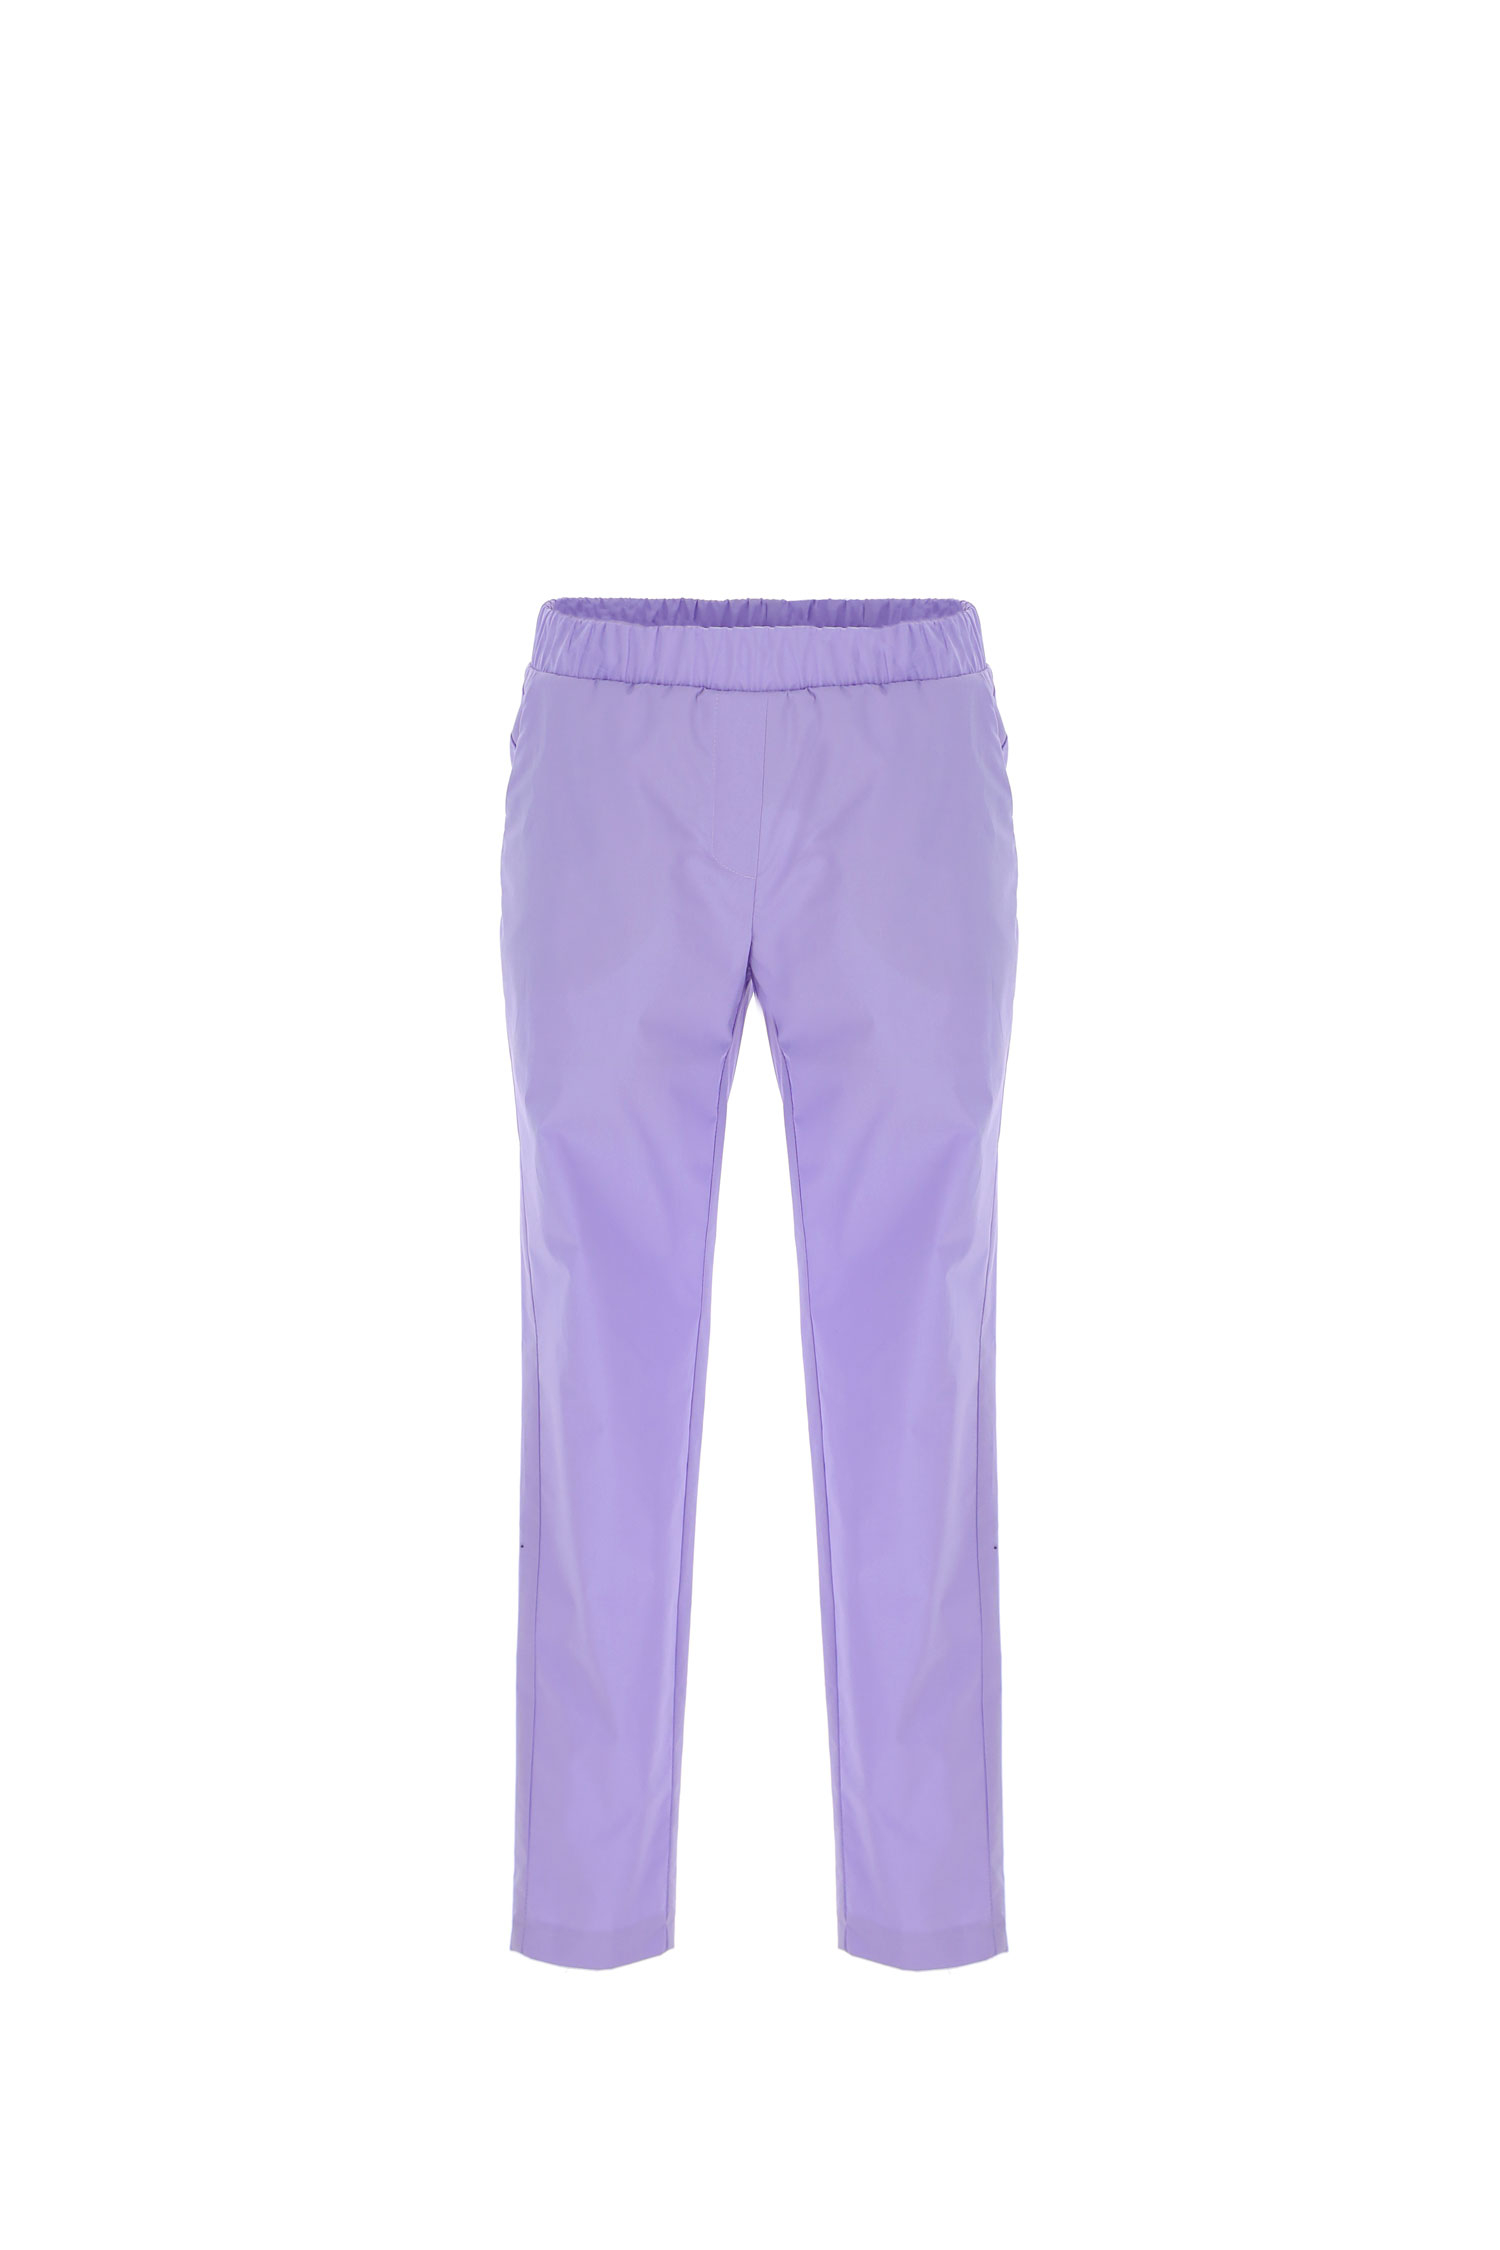 PANTALONI SLIM CON VITA ELASTICA IMPERIAL | Pantaloni | P1BWBGV1410